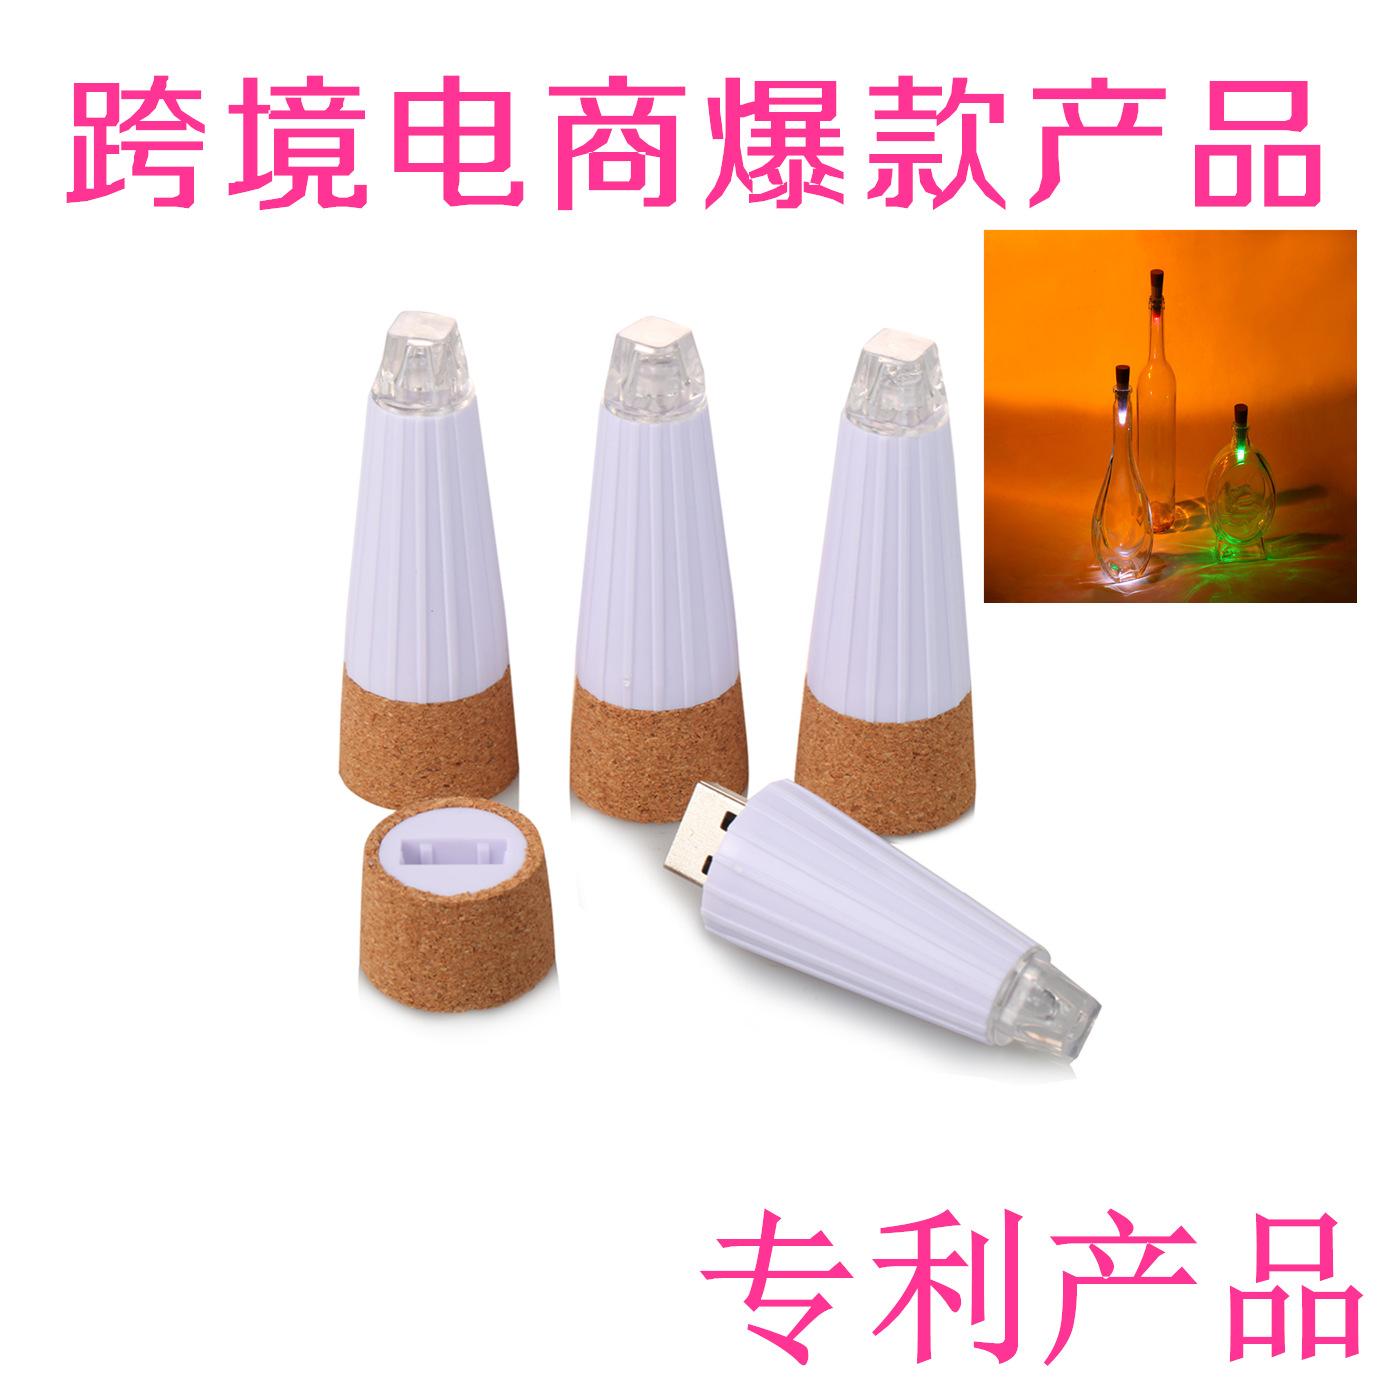 LED瓶塞灯 USB充电发光瓶盖LED软木塞 瓶盖灯 酒瓶灯